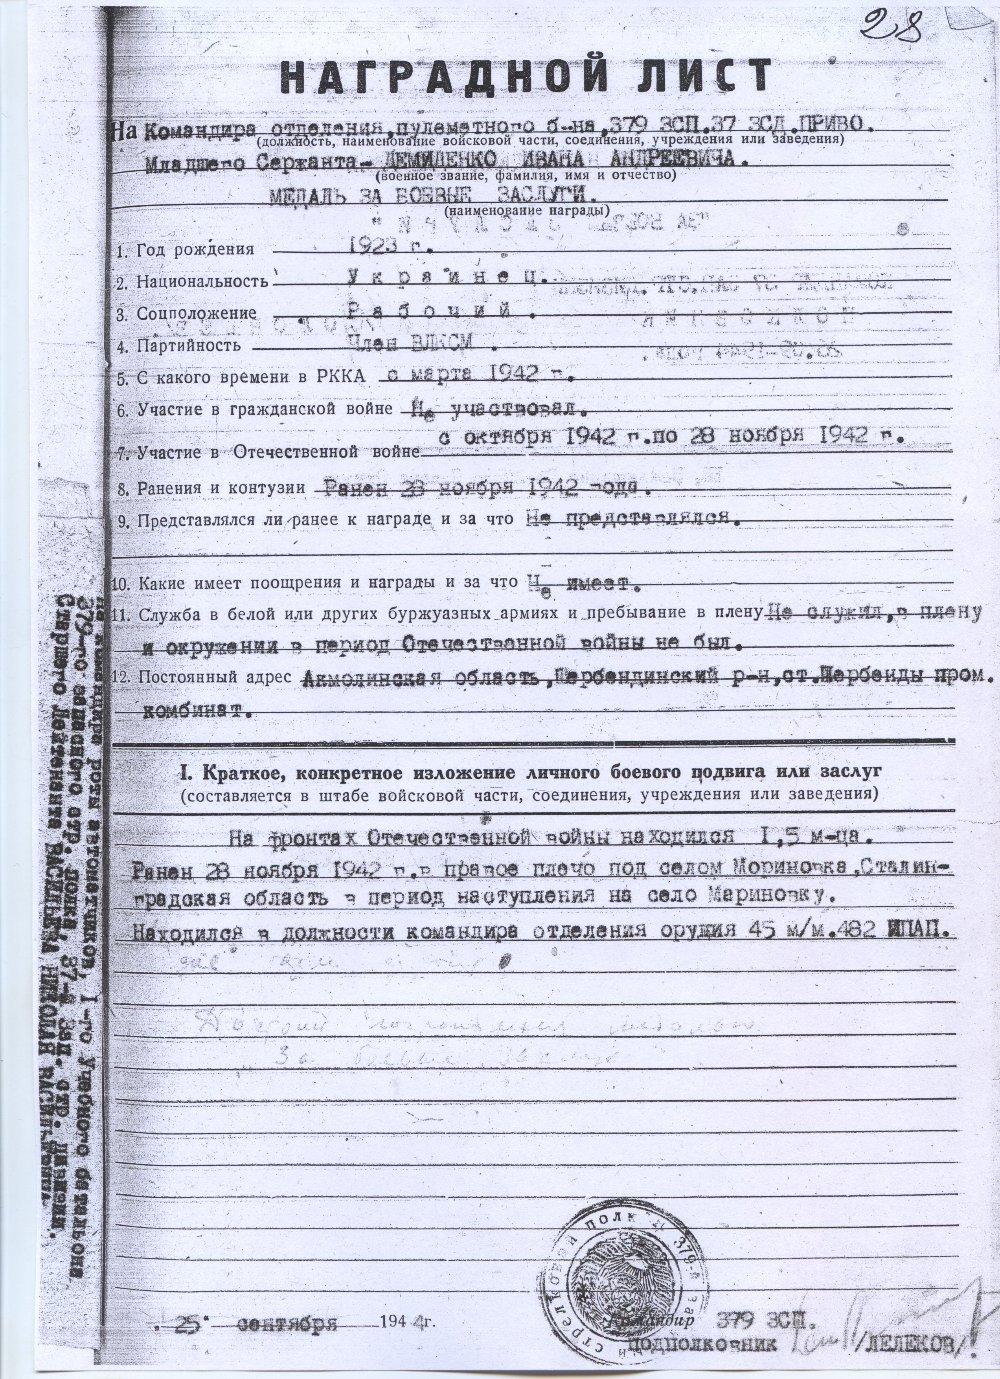 http://sf.uploads.ru/308bd.jpg